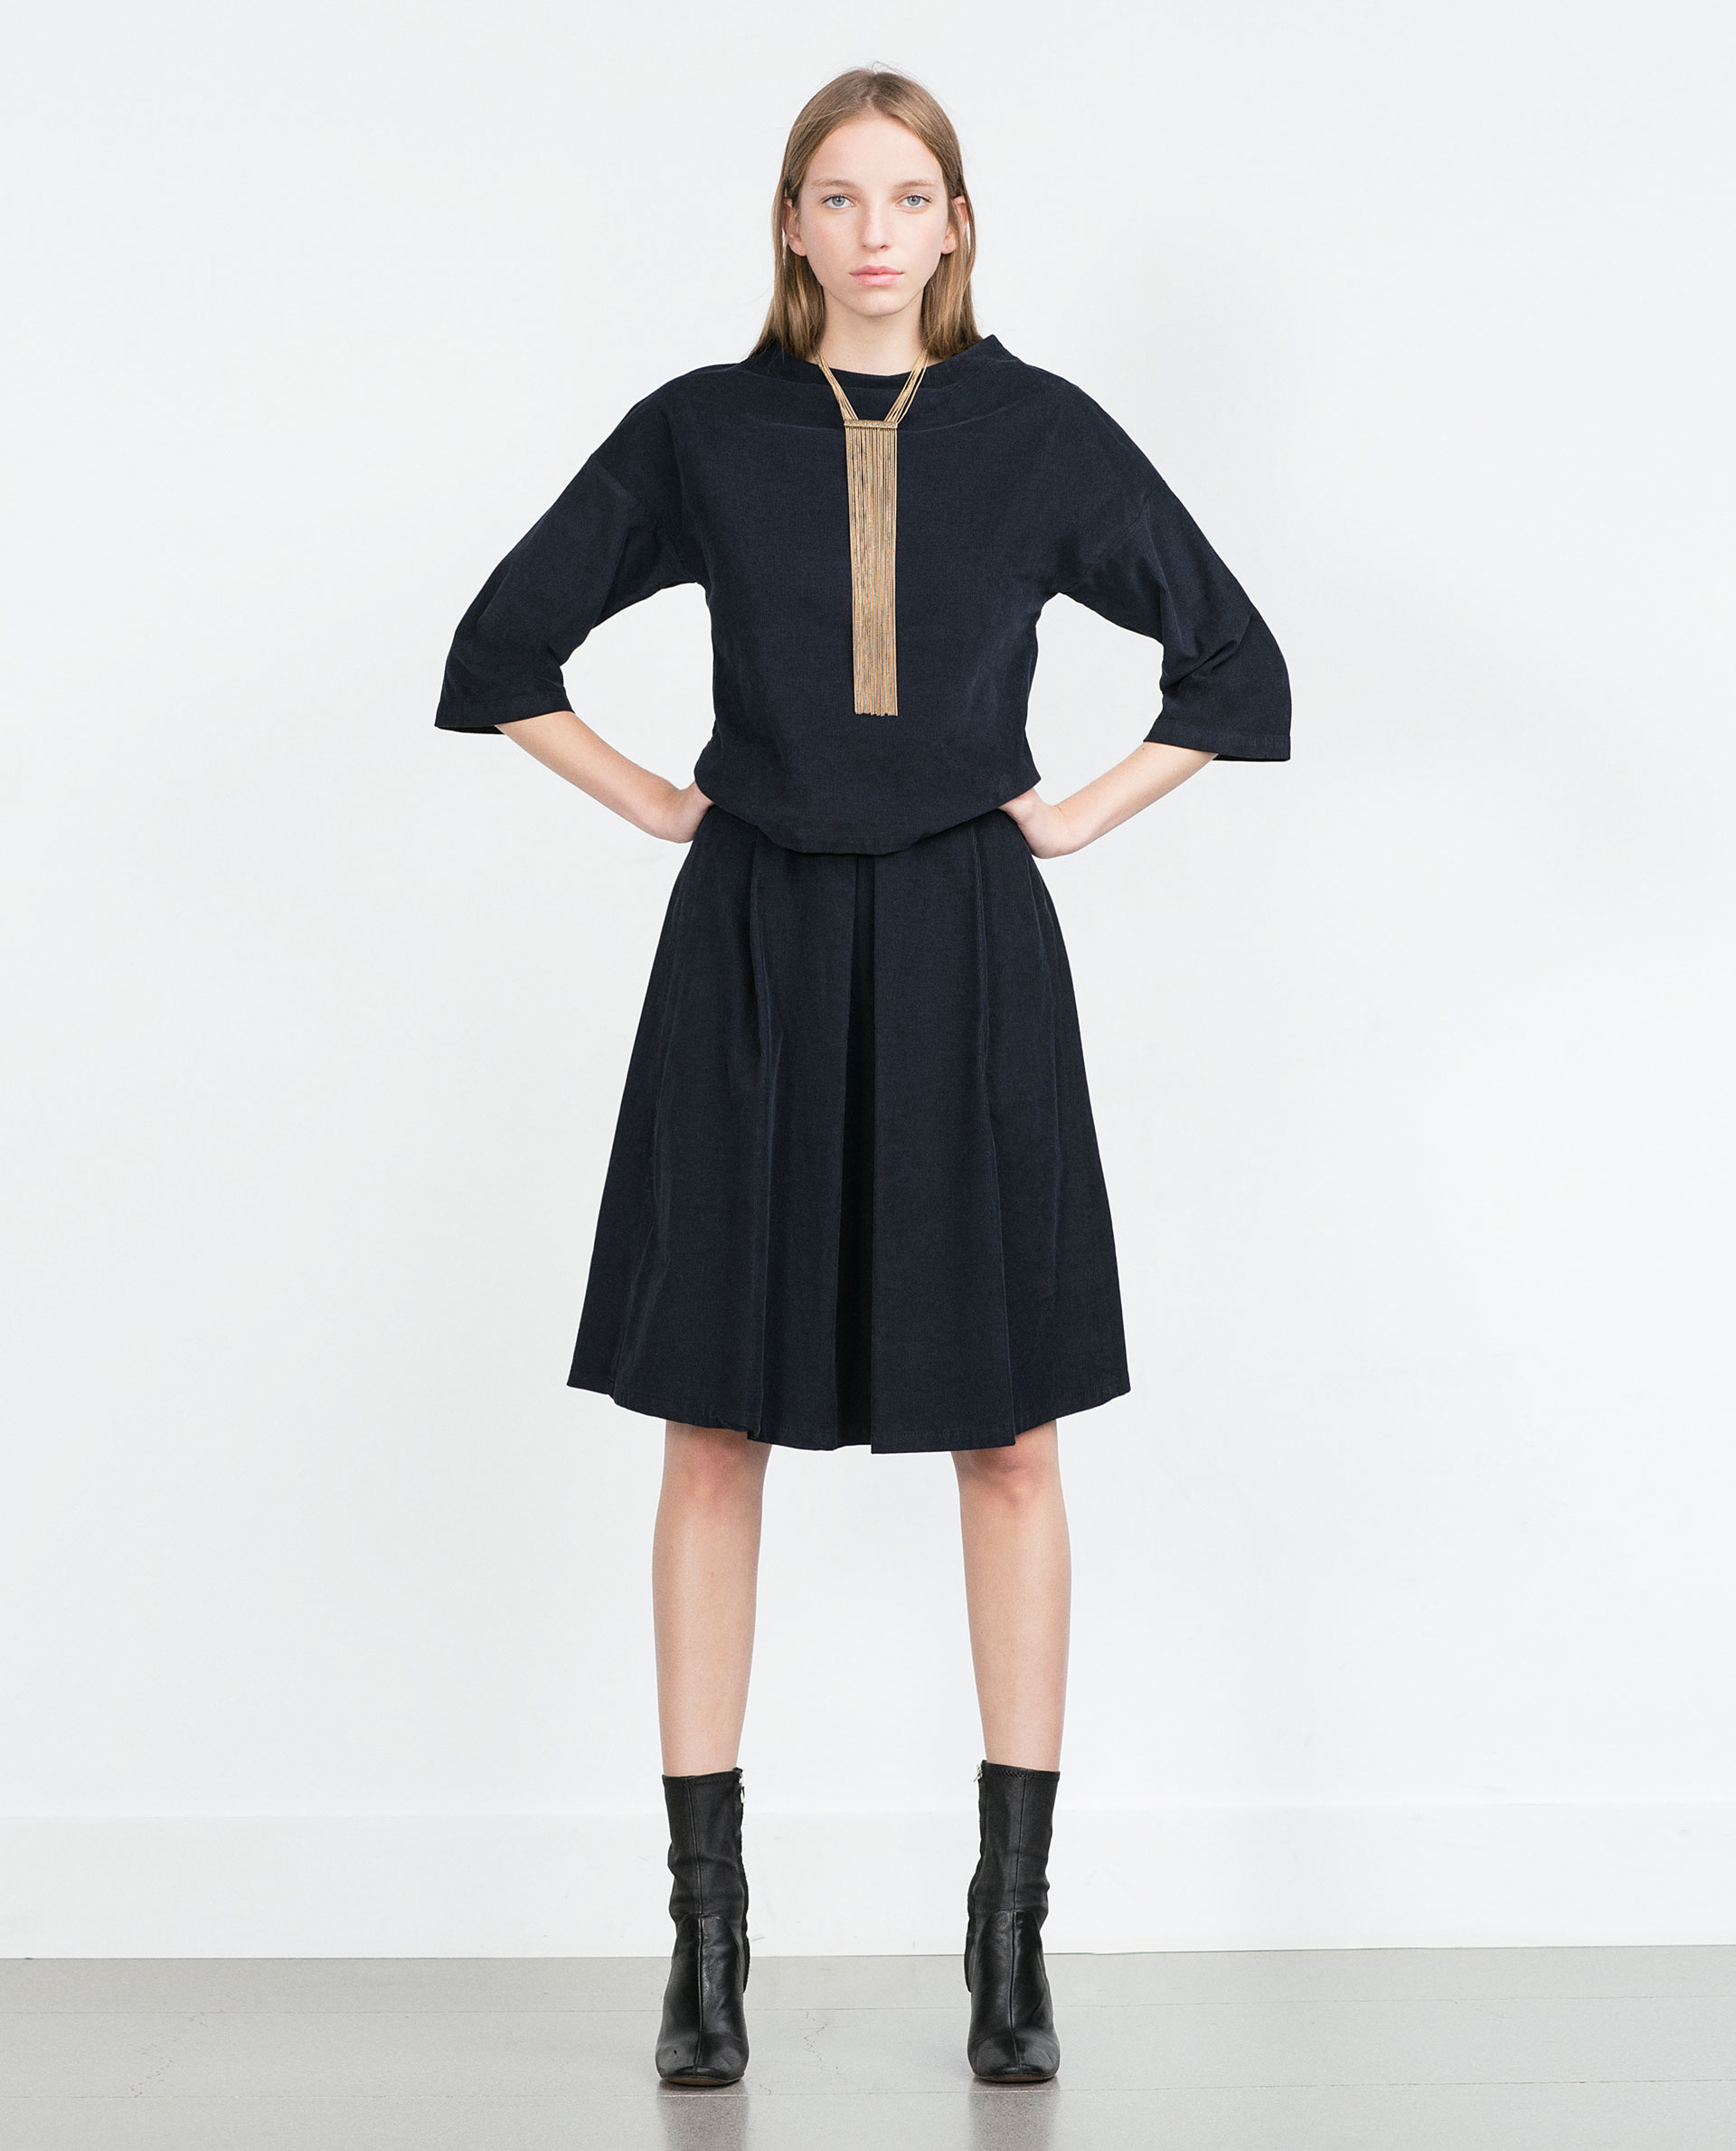 Blue corduroy skirt